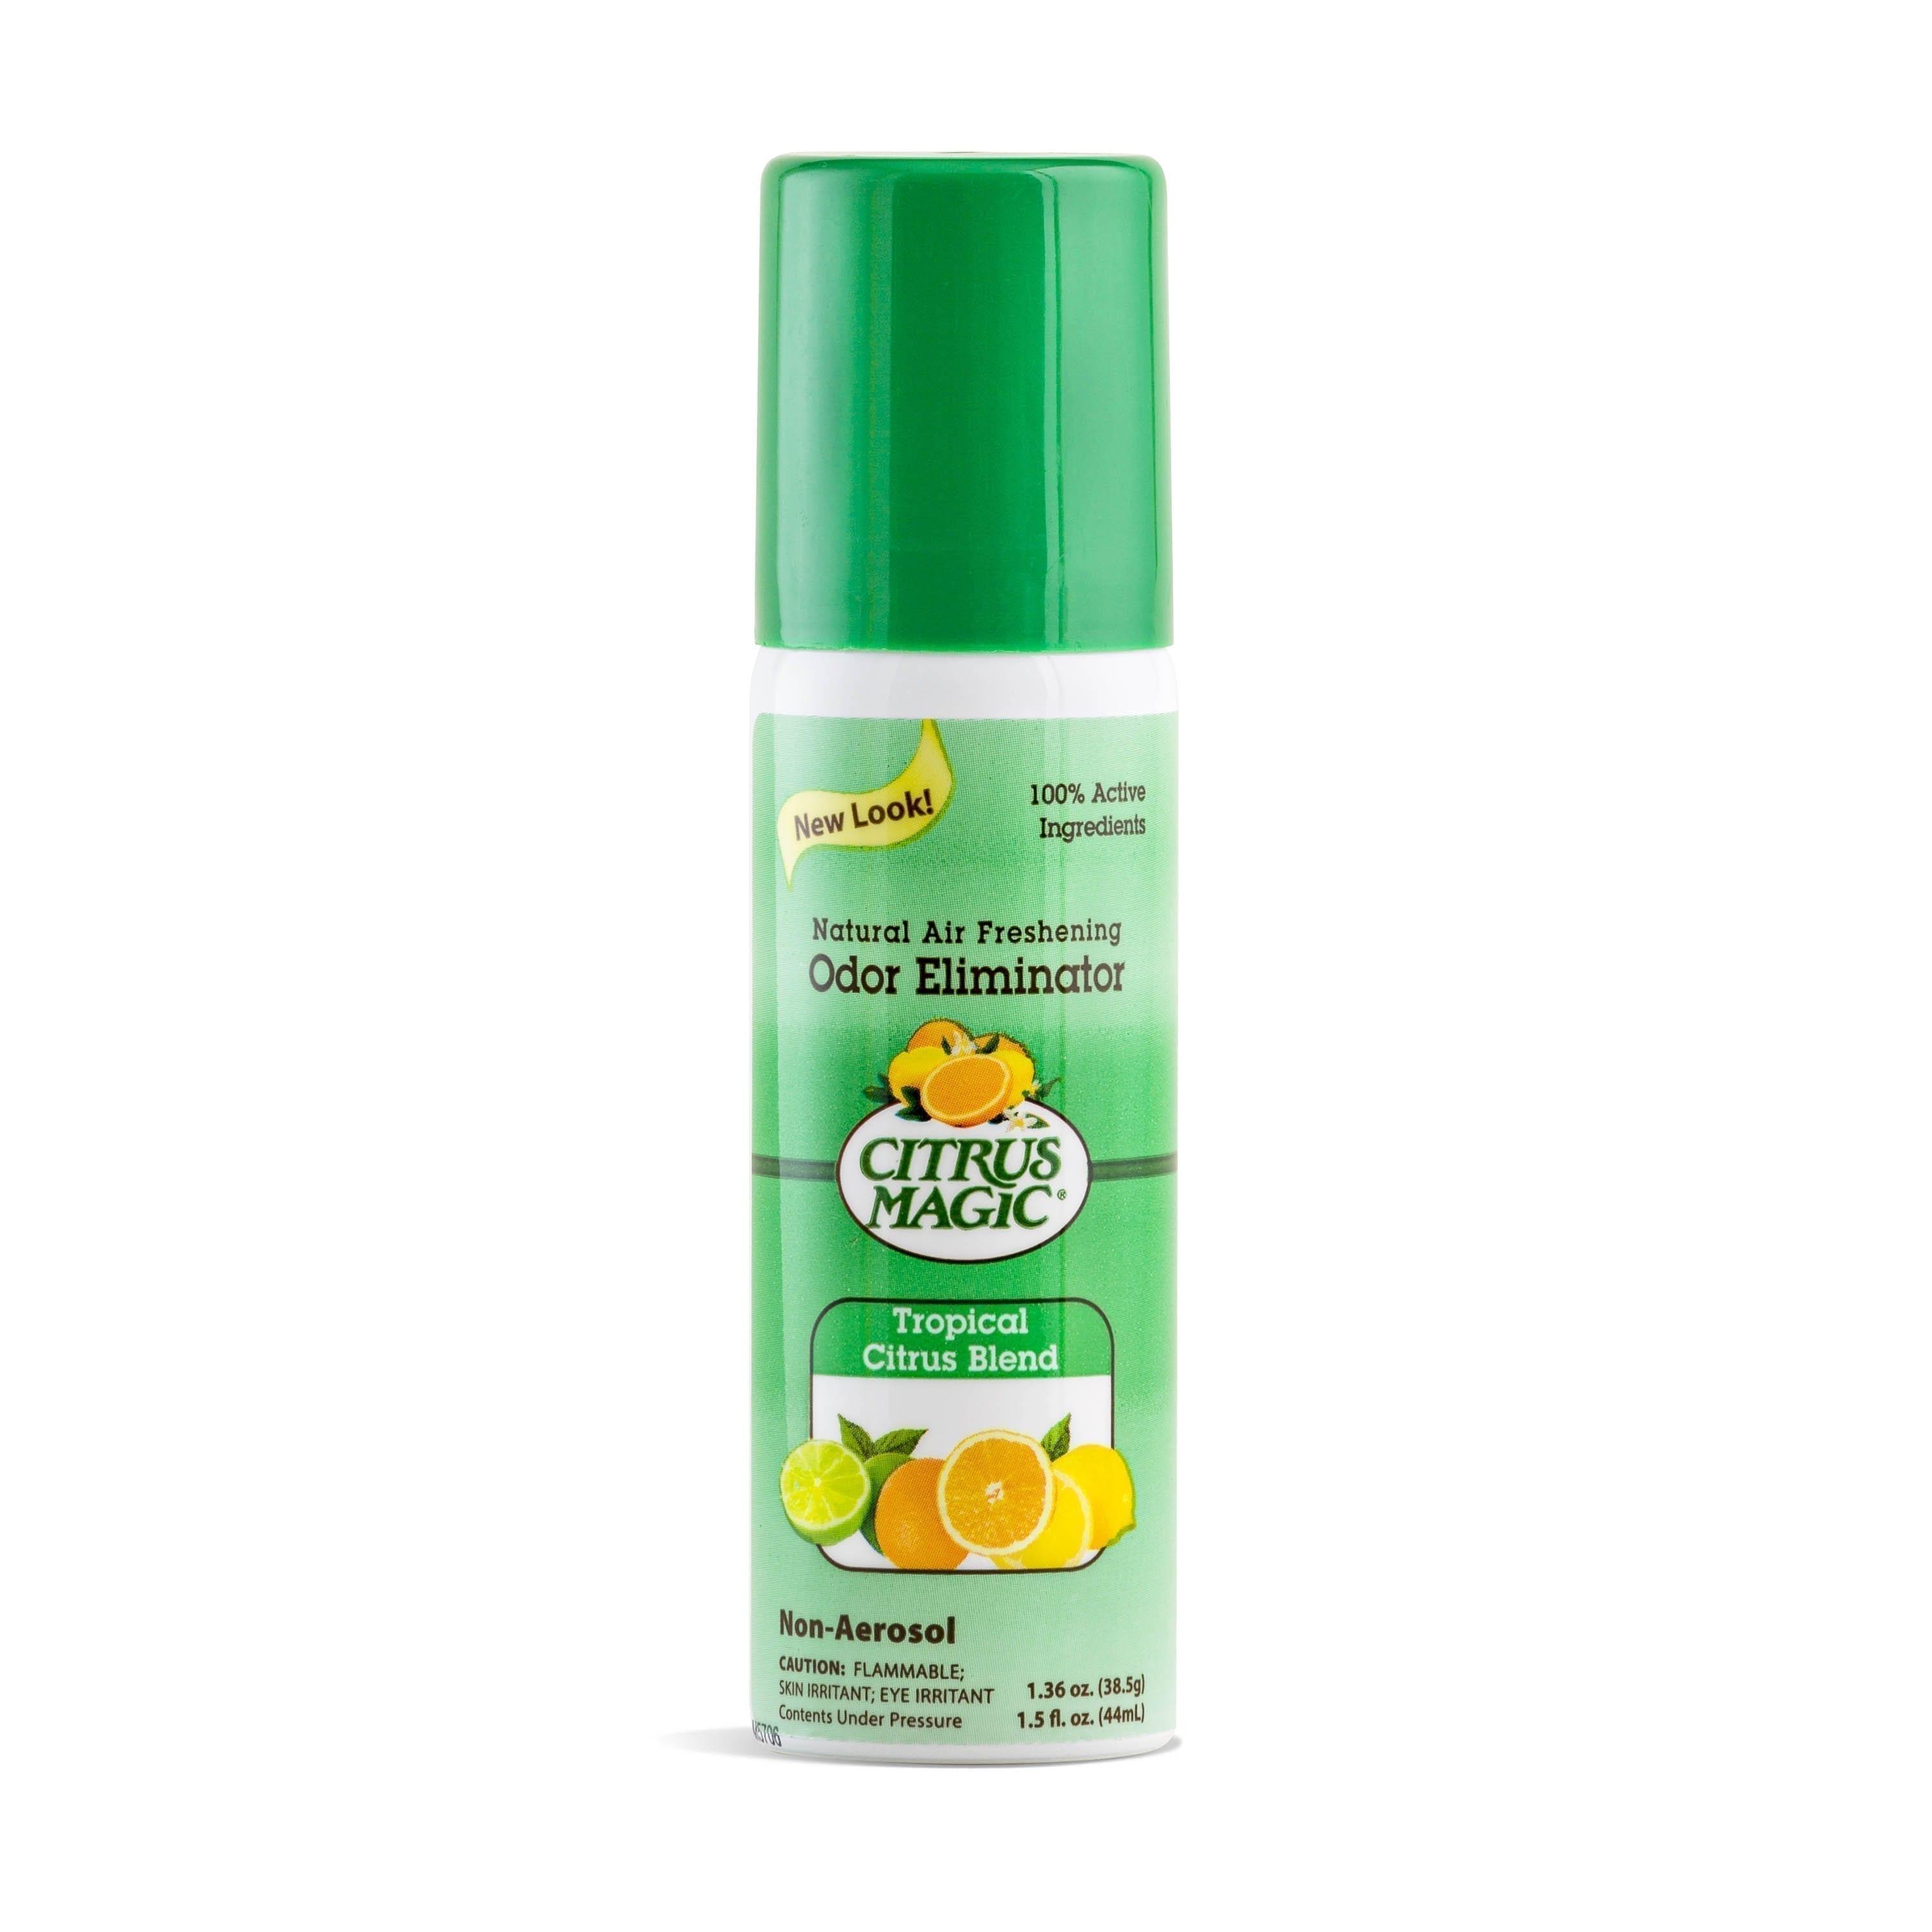 Citrus Magic Natural Odor Eliminating Air Freshener Spray, Tropical Citrus Blend